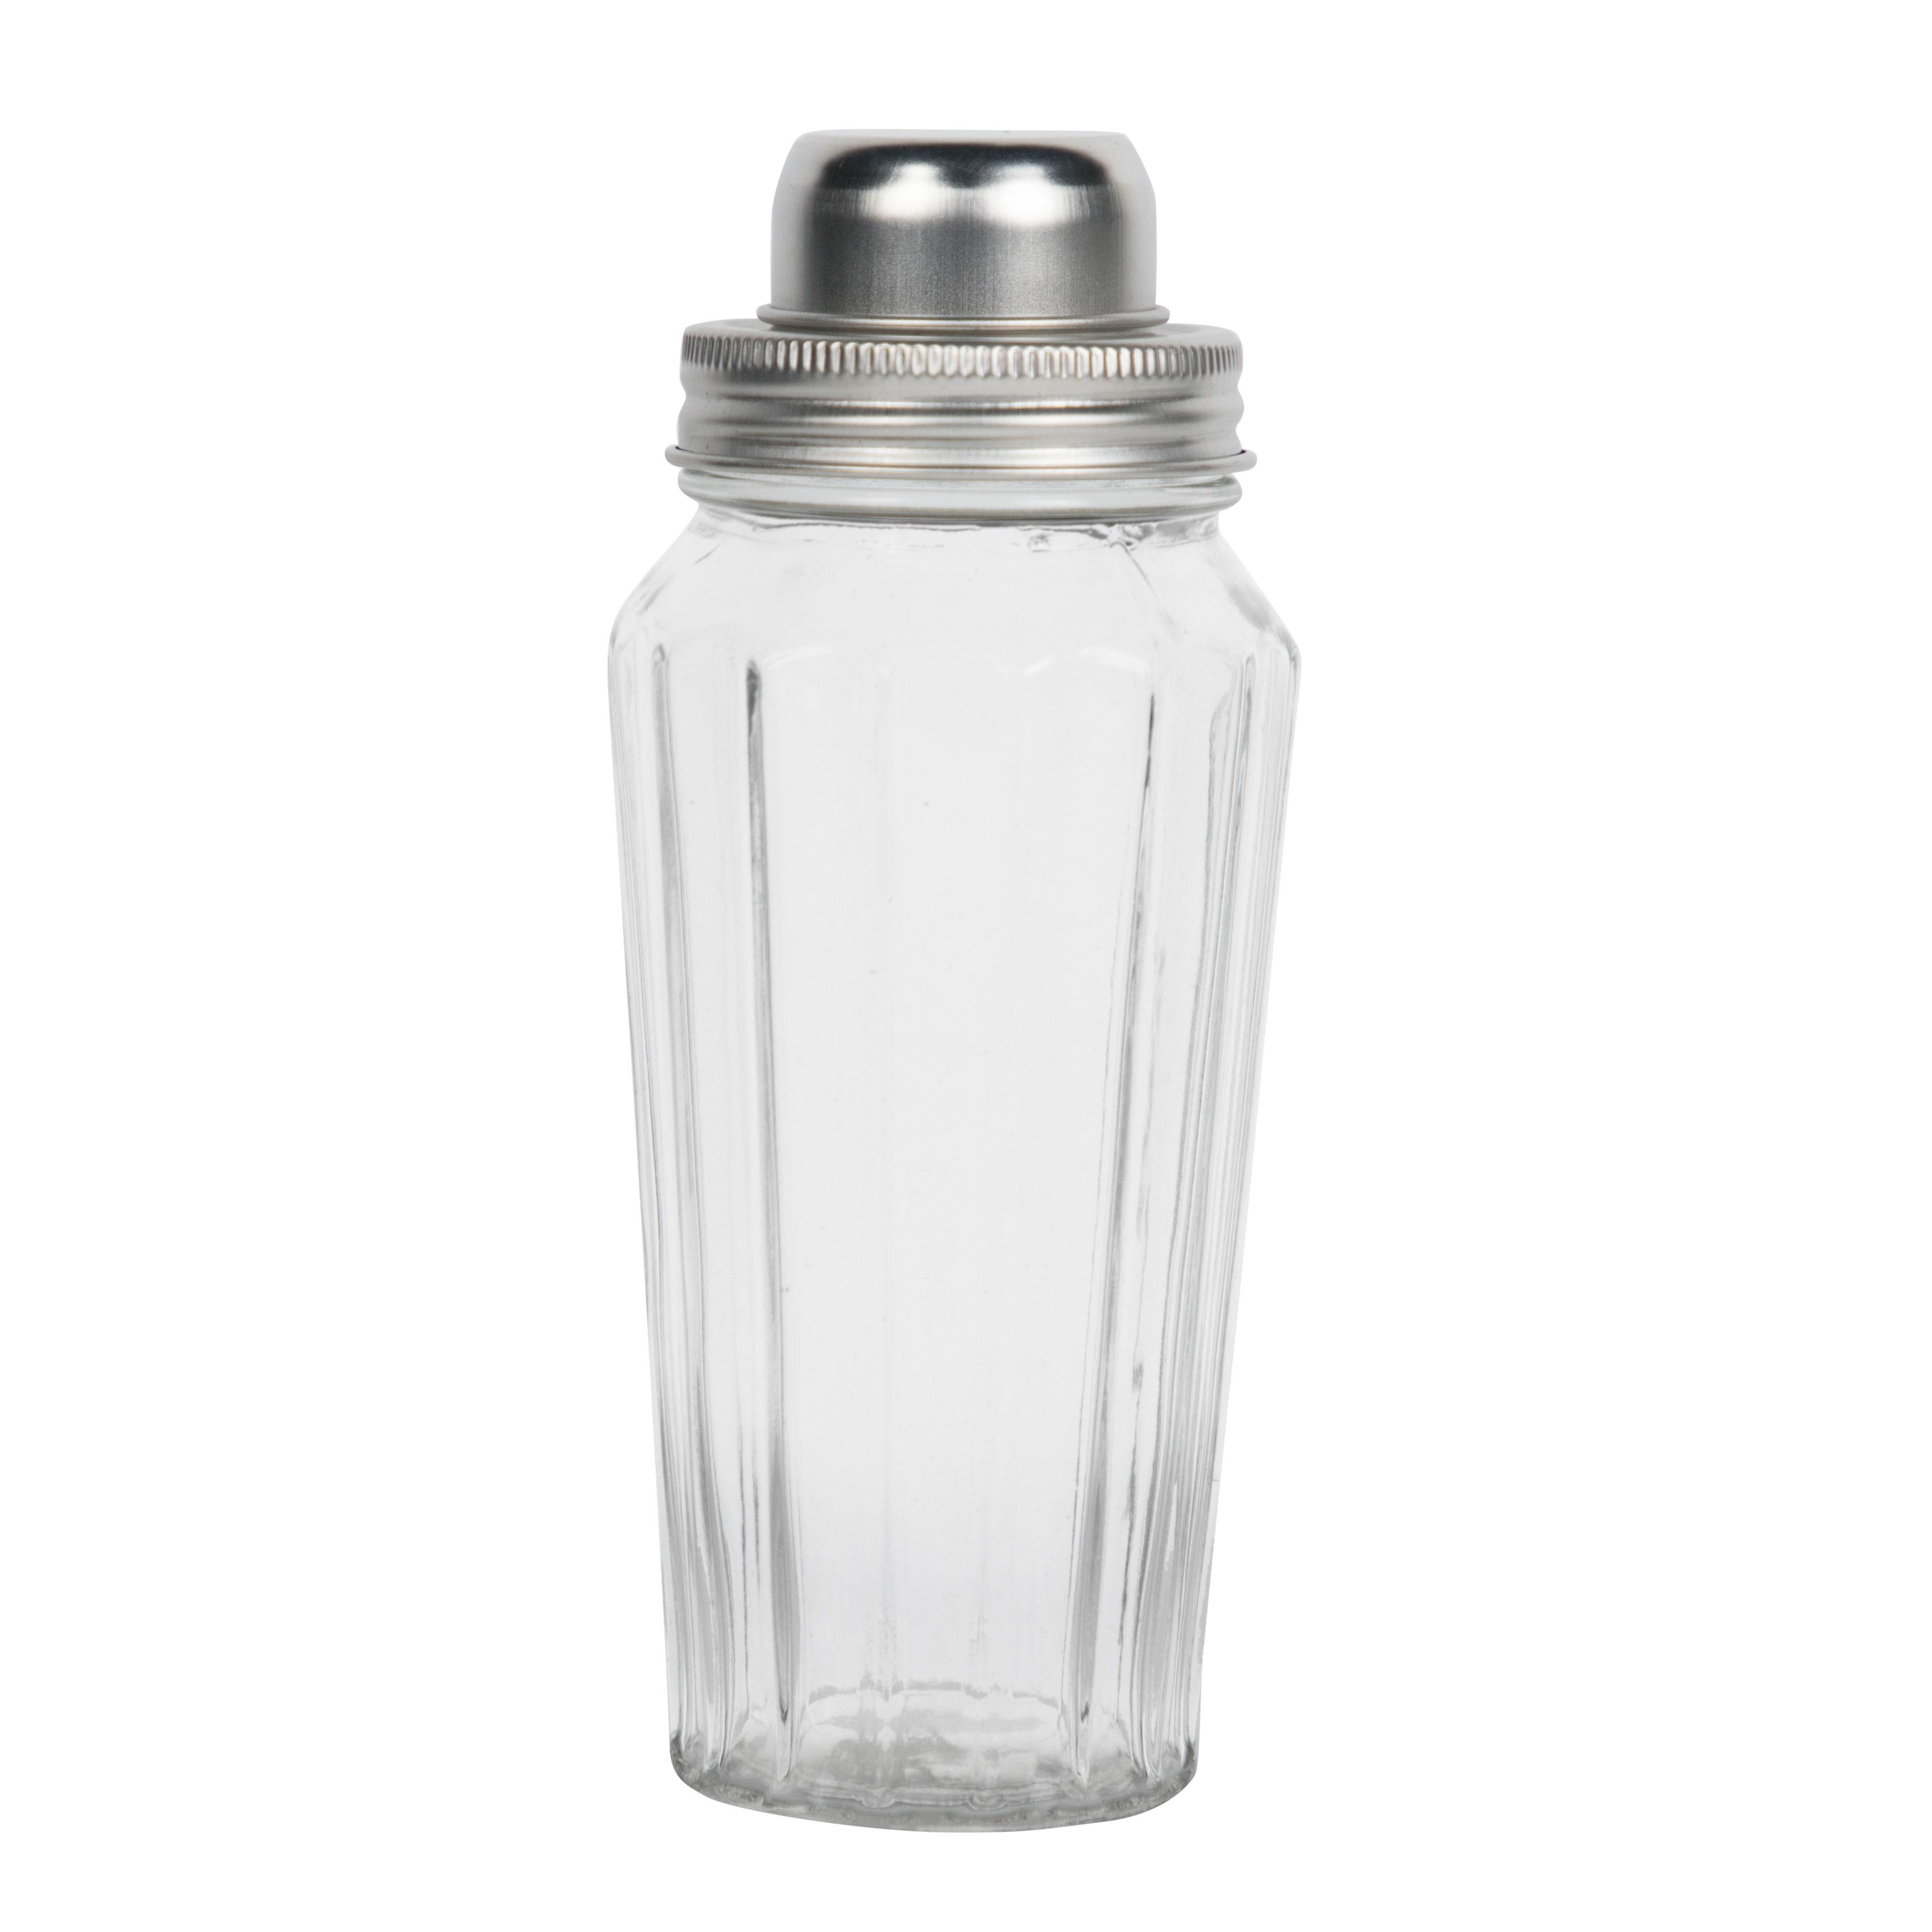 2pcs Glass Shaker - 695 ml